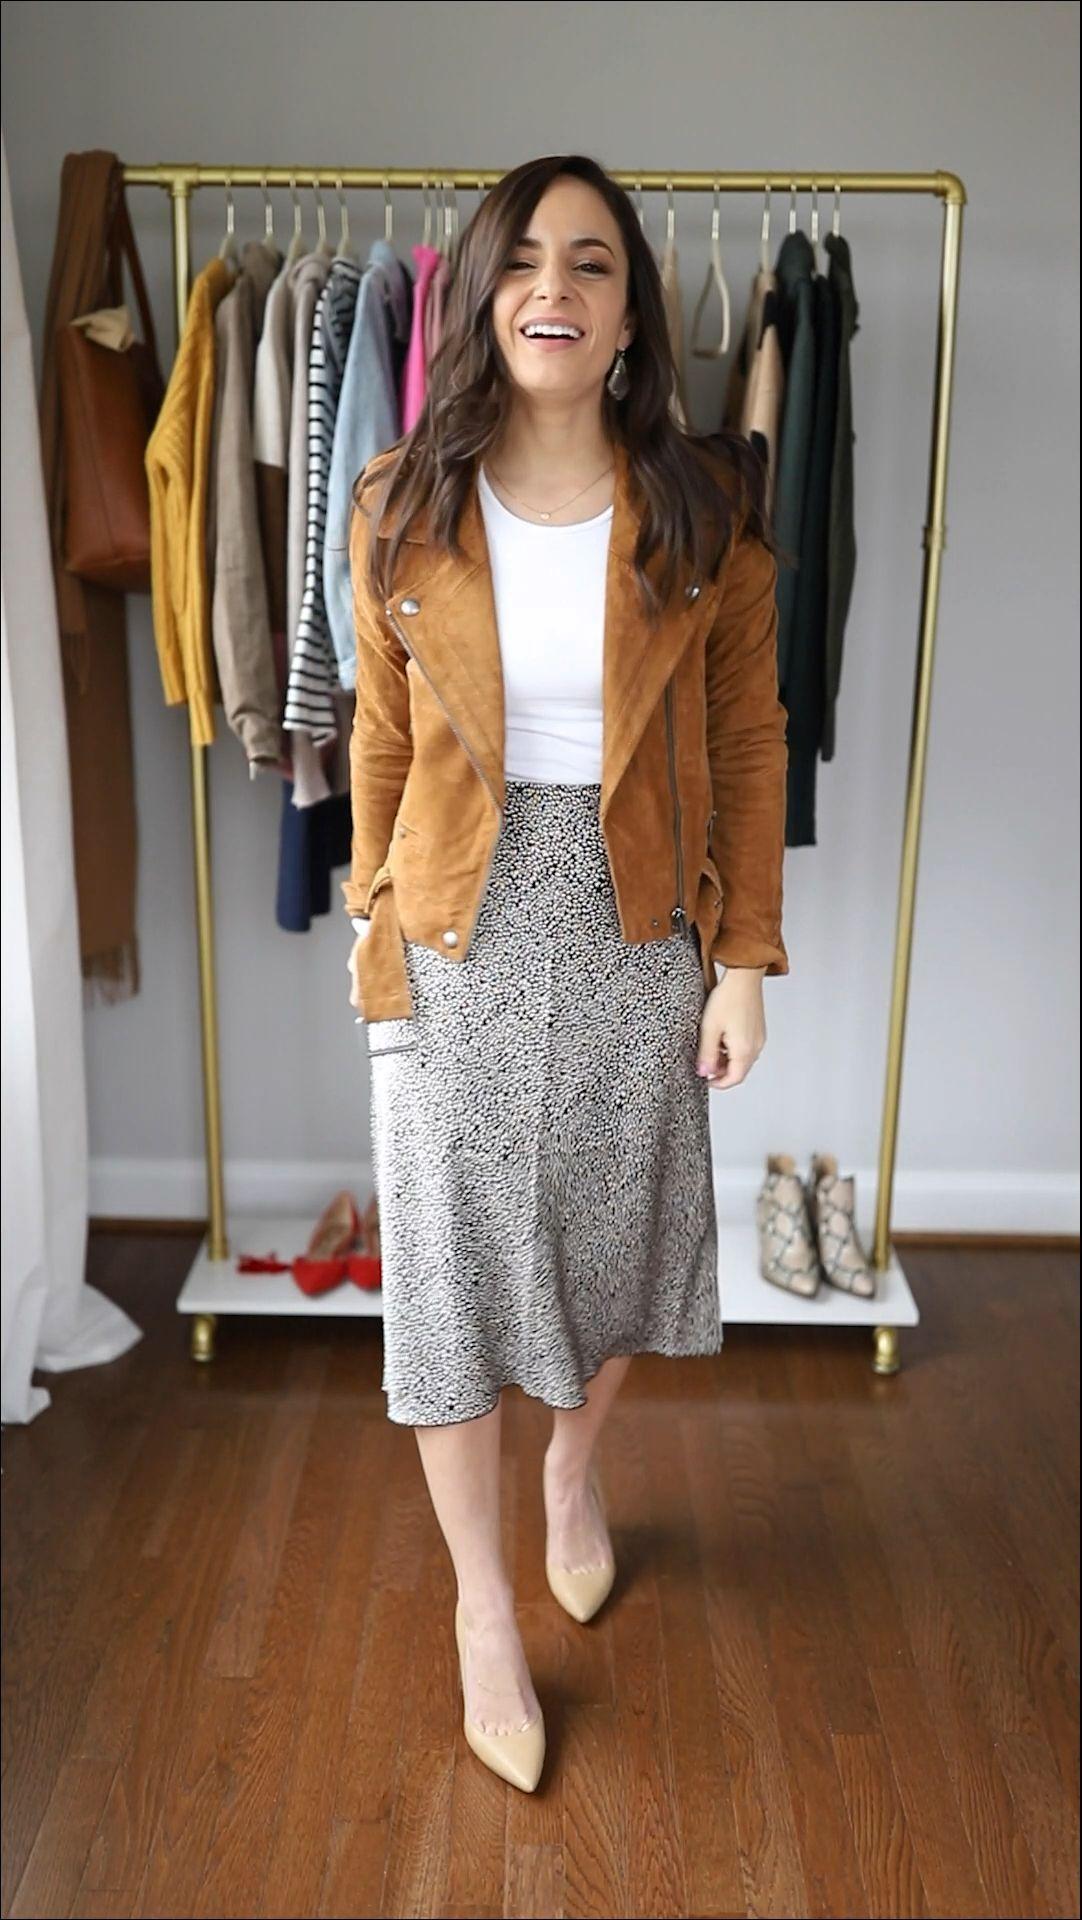 Four petite friendly midi skirt outfits | how to wear a midi skirt | midi skirt outfits | petite style tips #styleblogger